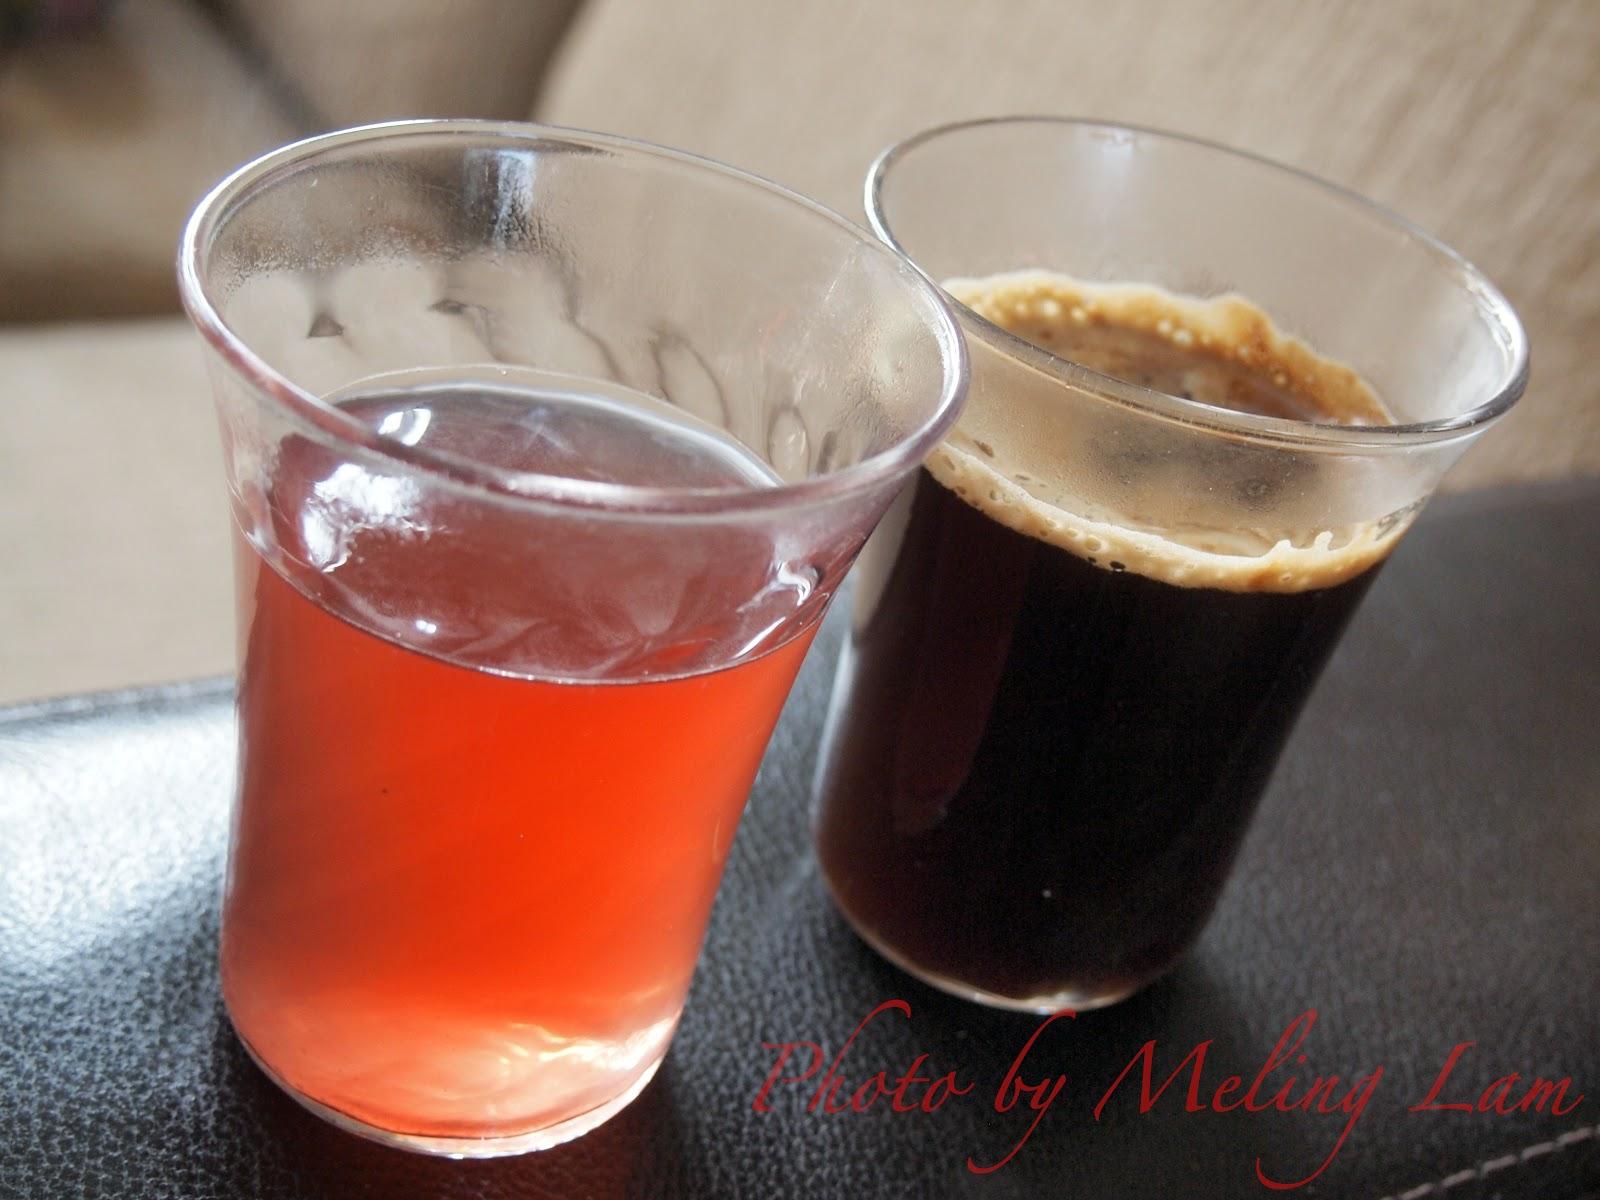 kilo off slimming coffee slimming tea 瘦身 減肥